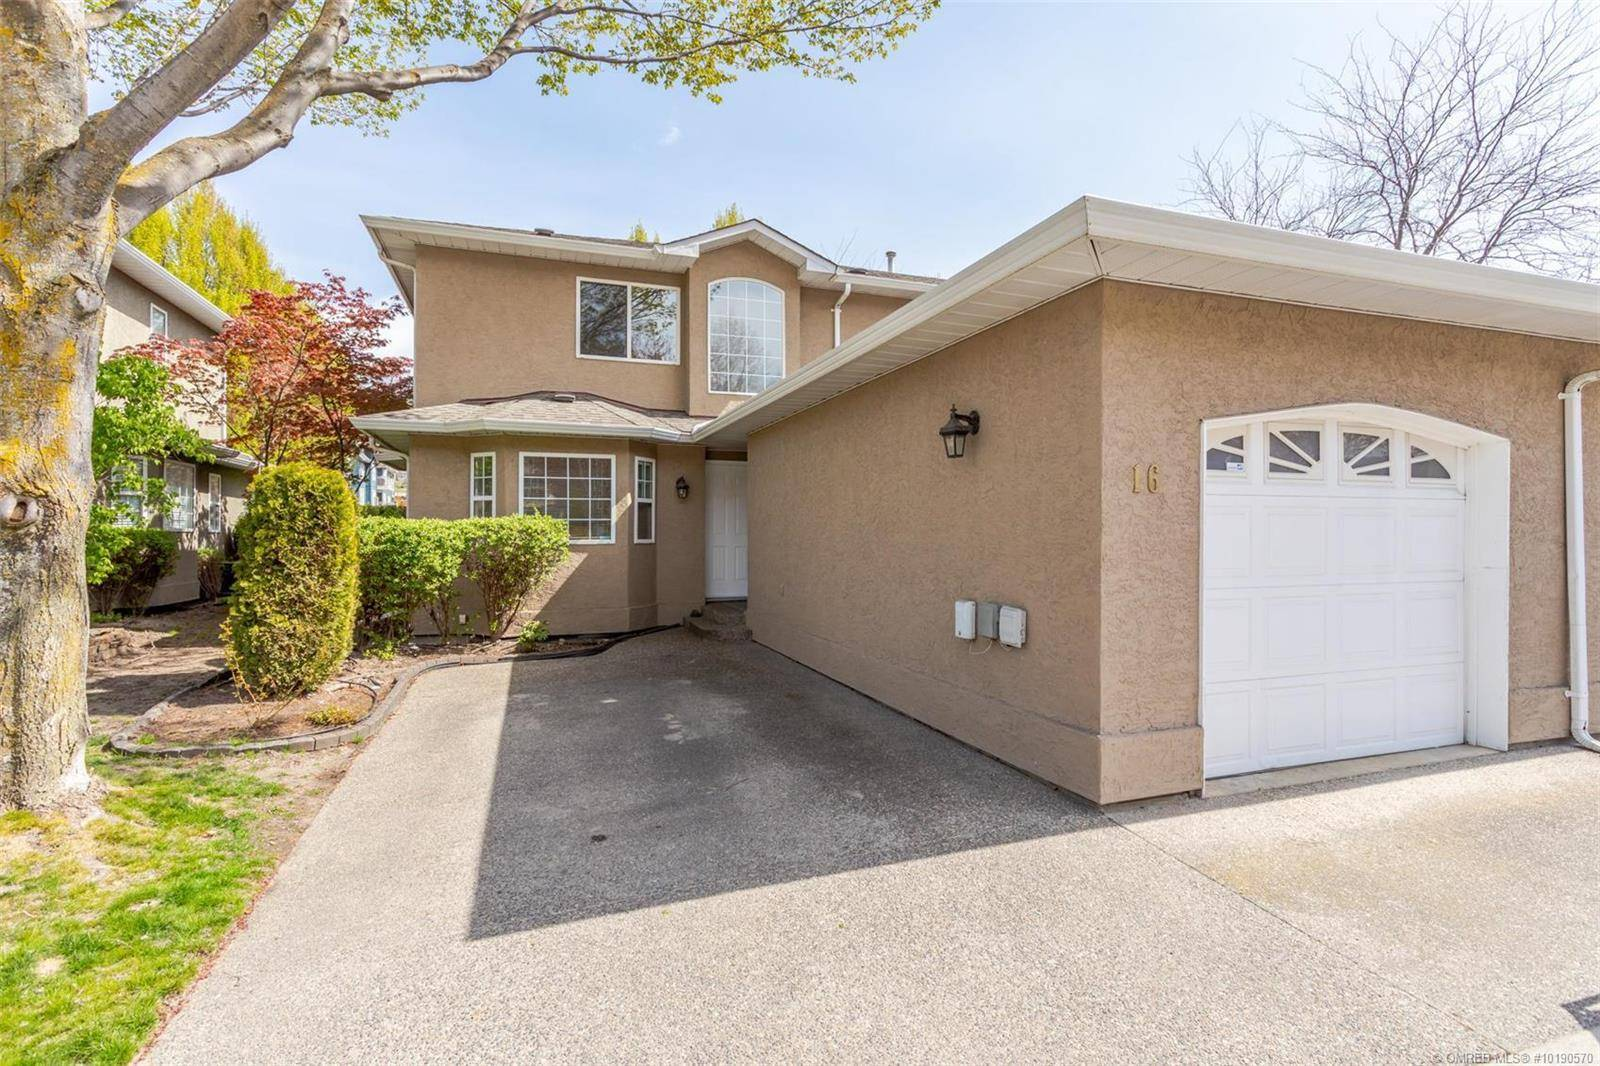 Townhouse for sale at 545 Glenmeadows Rd Unit 16 Kelowna British Columbia - MLS: 10190570